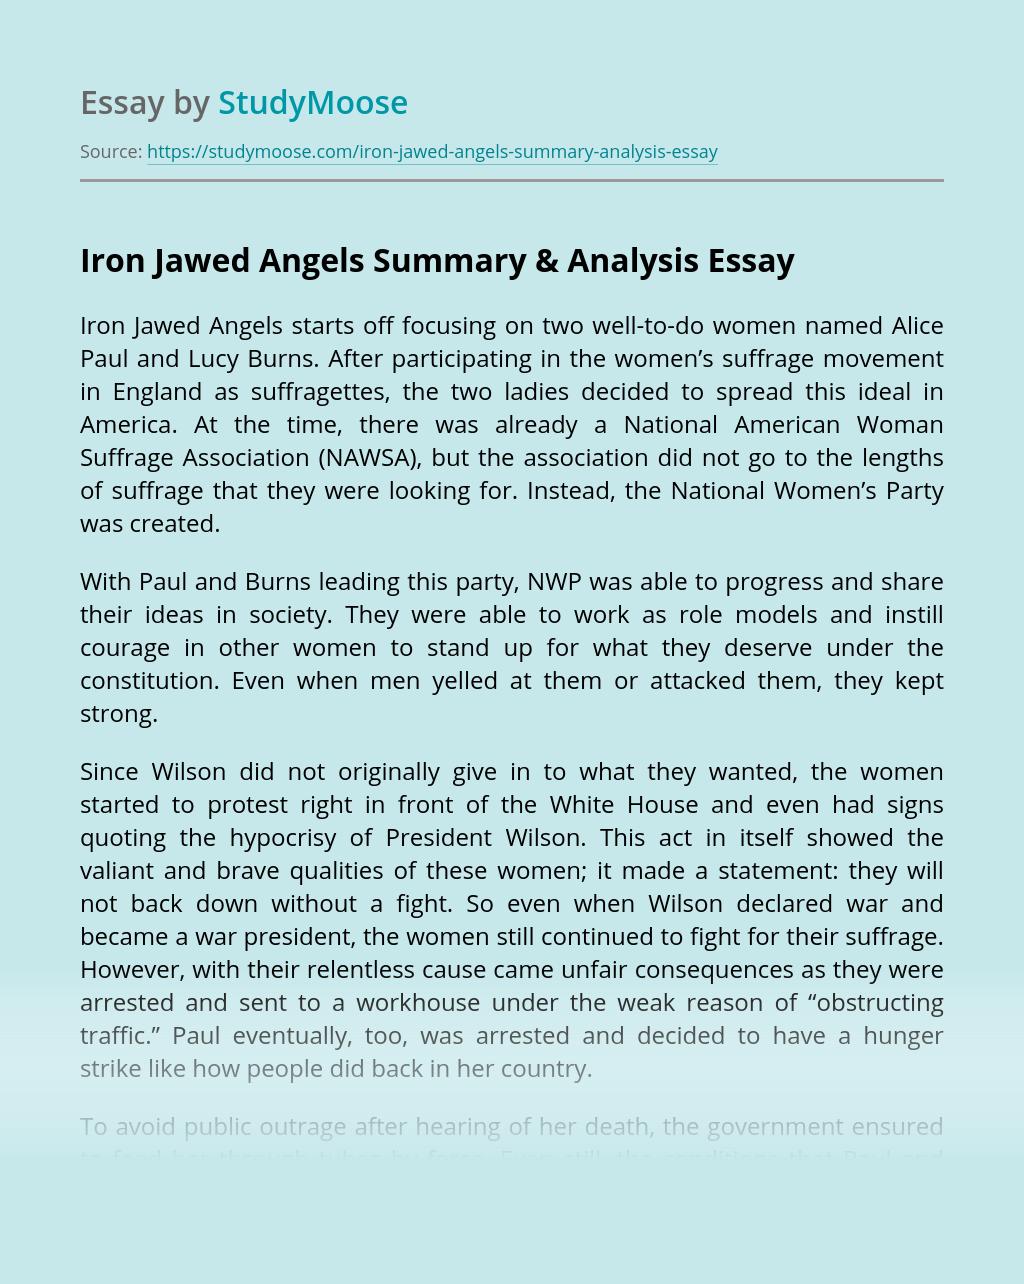 Iron Jawed Angels Summary & Analysis